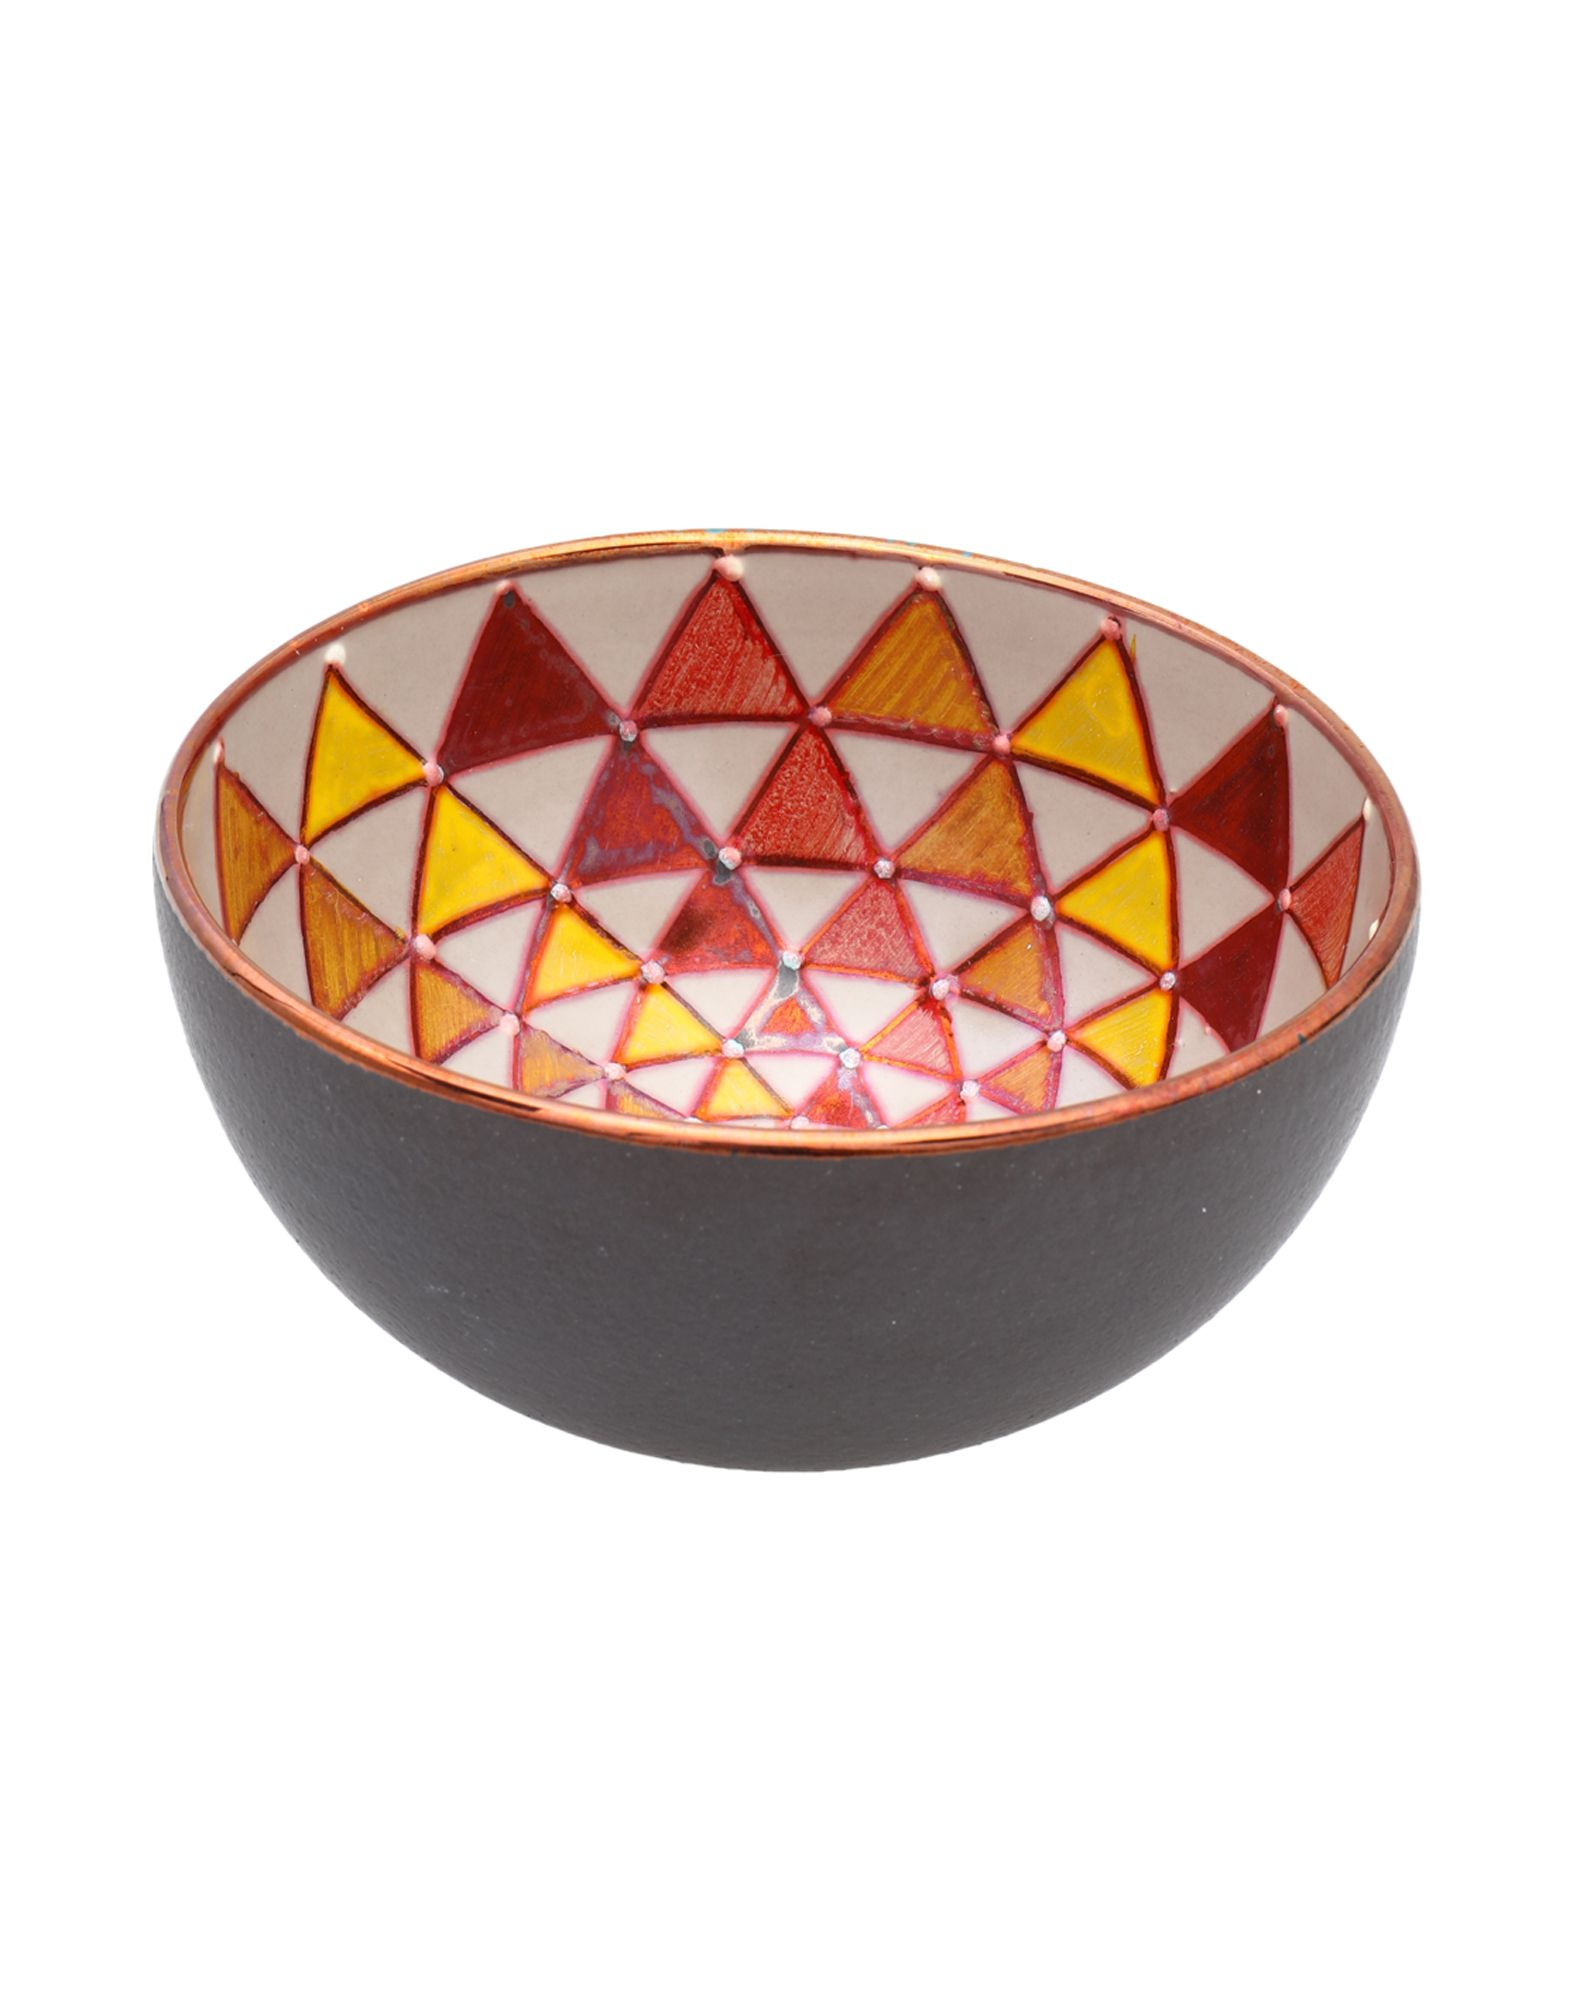 《送料無料》BOTTEGA VIGNOLI Unisex 雑貨 赤茶色 陶製 100%